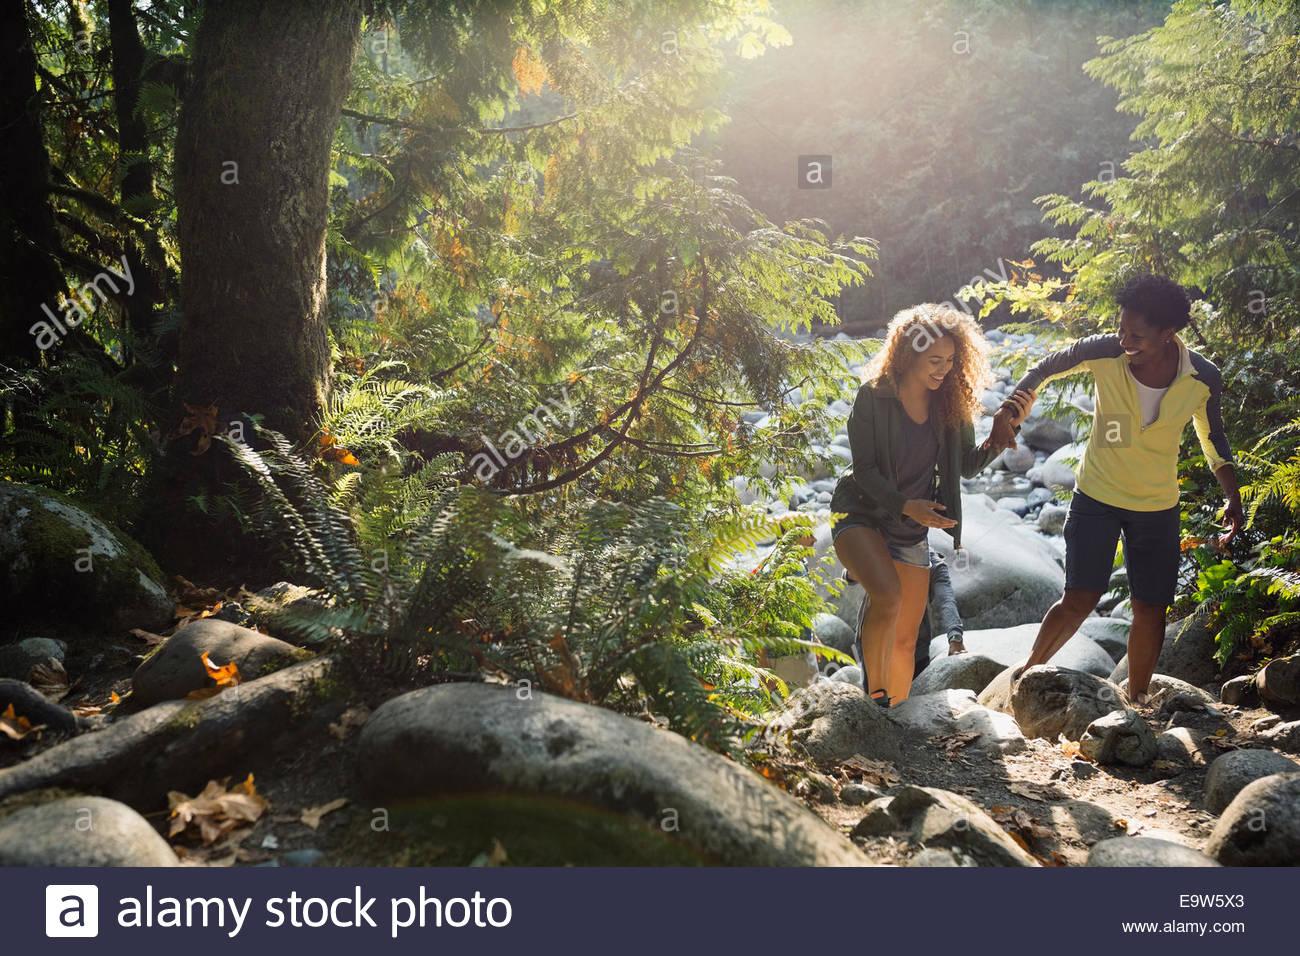 Madre e hija senderismo en sunny woods Imagen De Stock